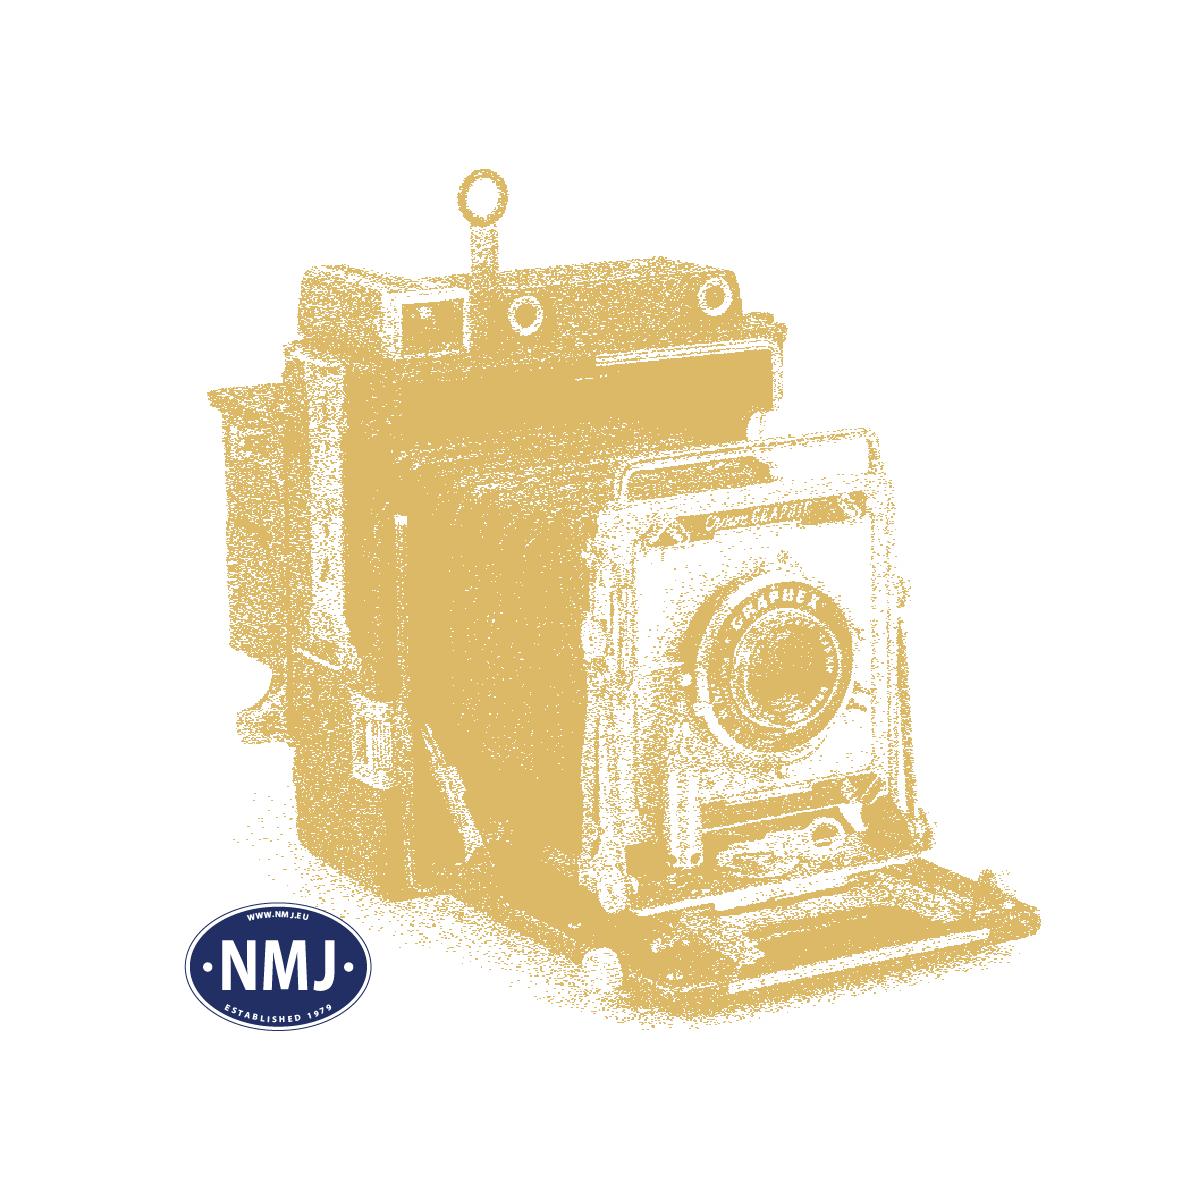 MWB-M001 - Gressmatte, Rough Medow, Vår, 30 x 21 Cm